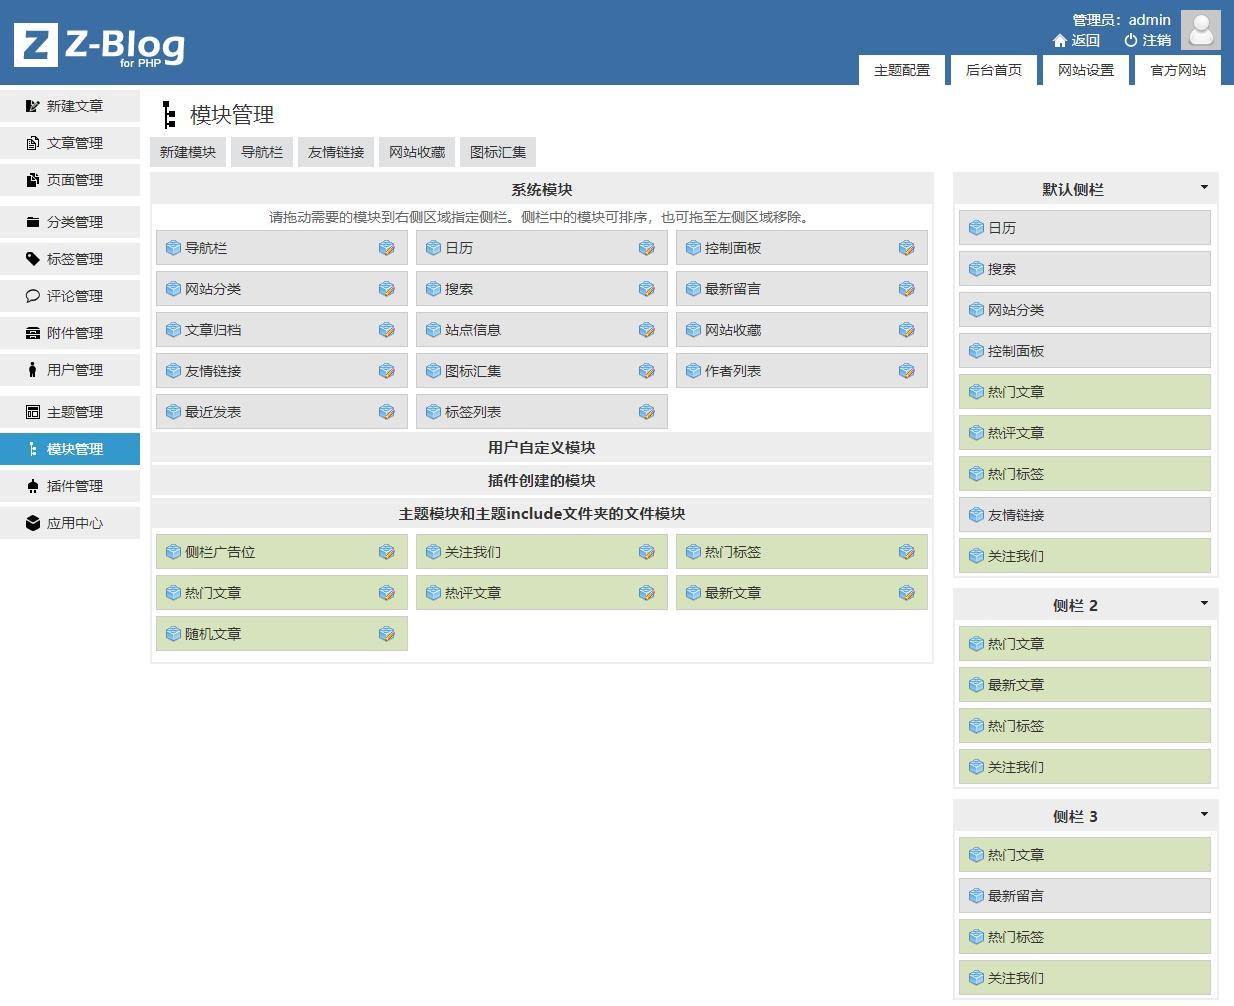 Soso 响应式博客主题 响应式博客 博客模板 Z blogPHP Z blogPHP  第4张